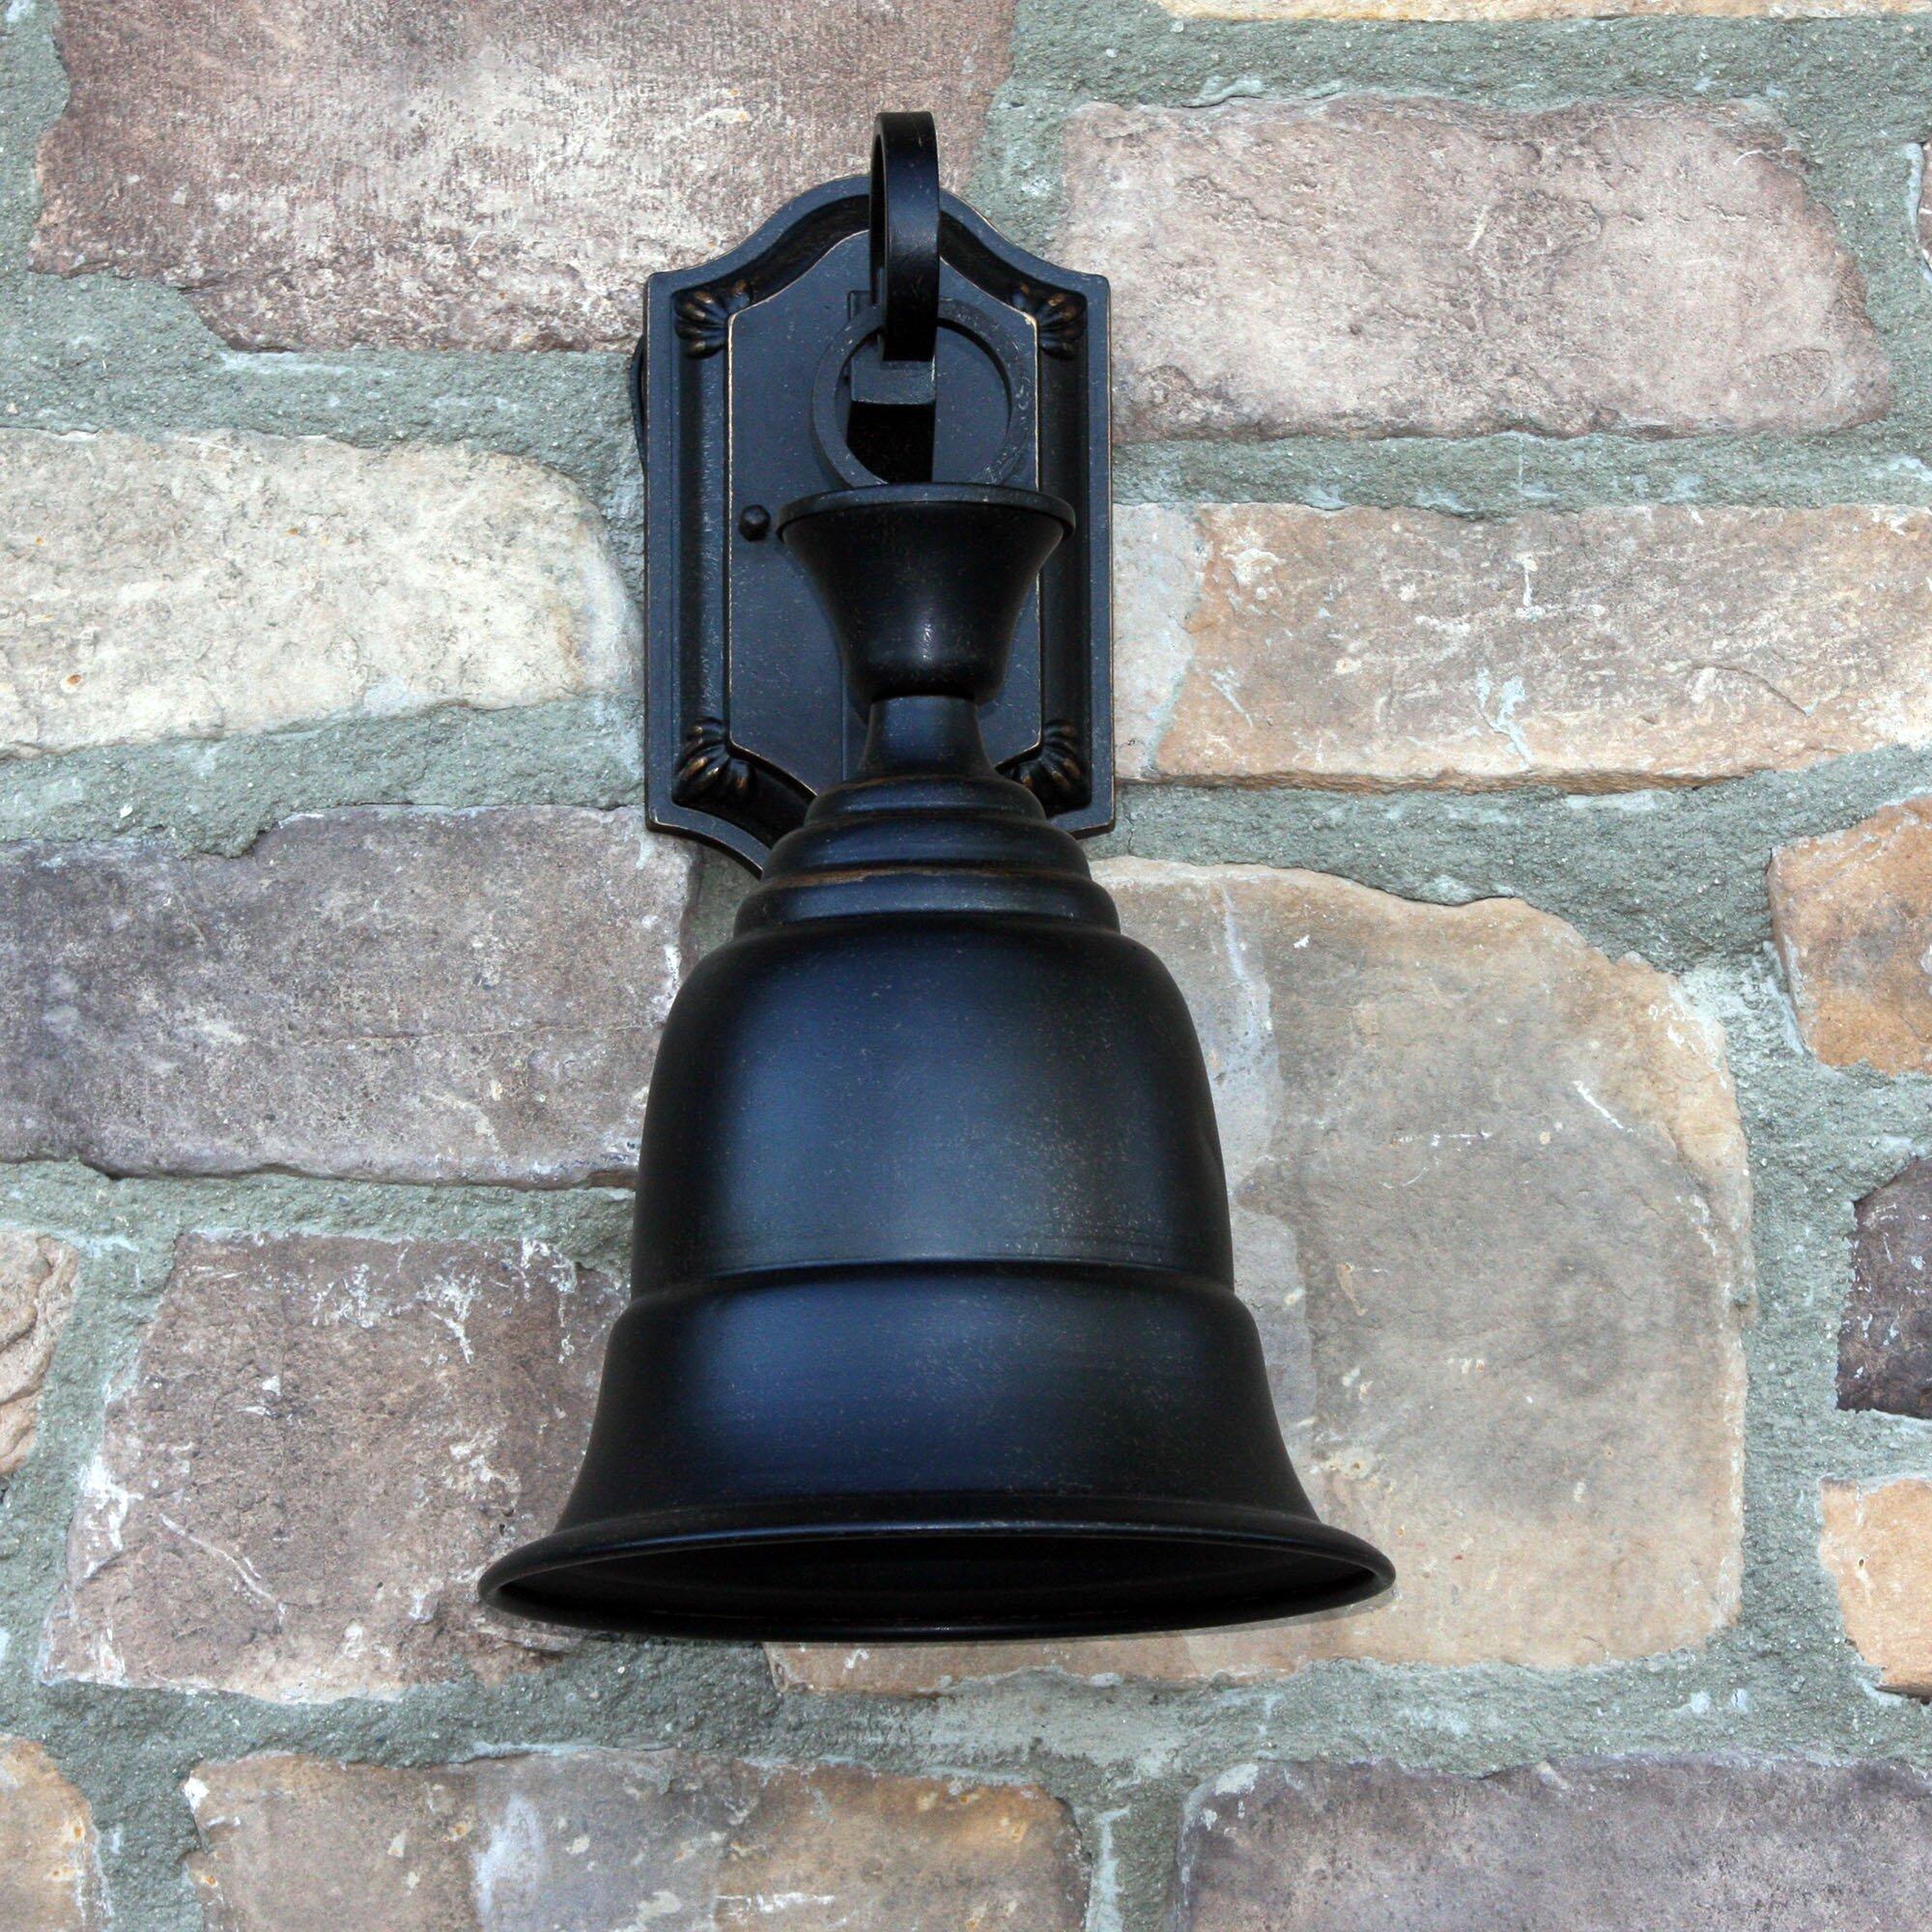 Goodyear 1 Light Outdoor Barn Light: Y Decor Liberty 1-Light Outdoor Barn Light & Reviews